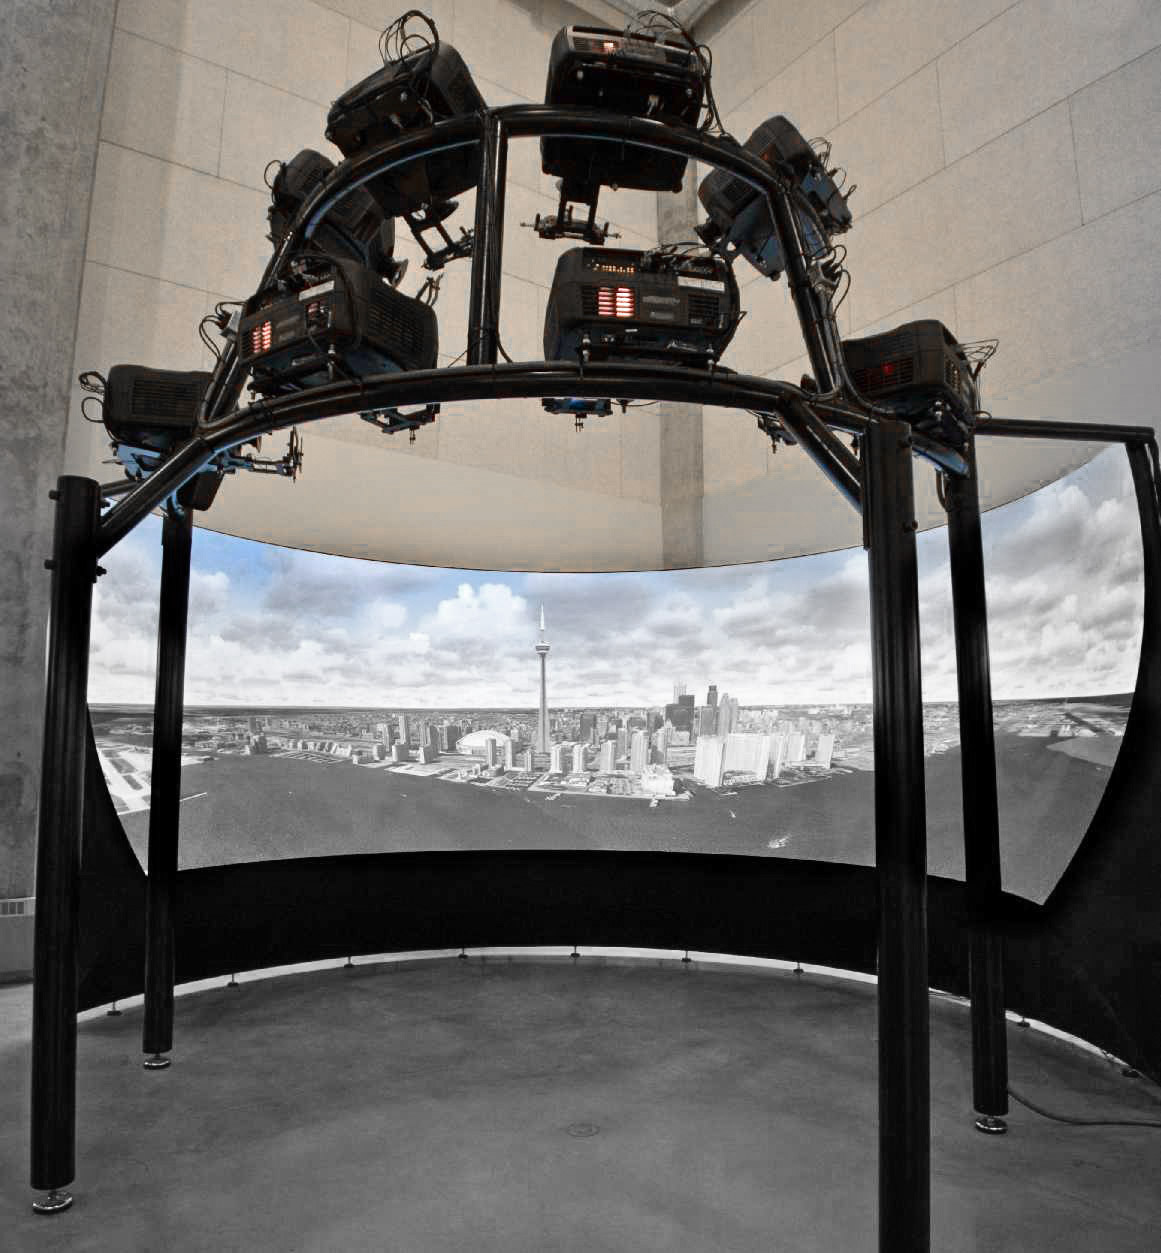 carlton-simulator.jpg